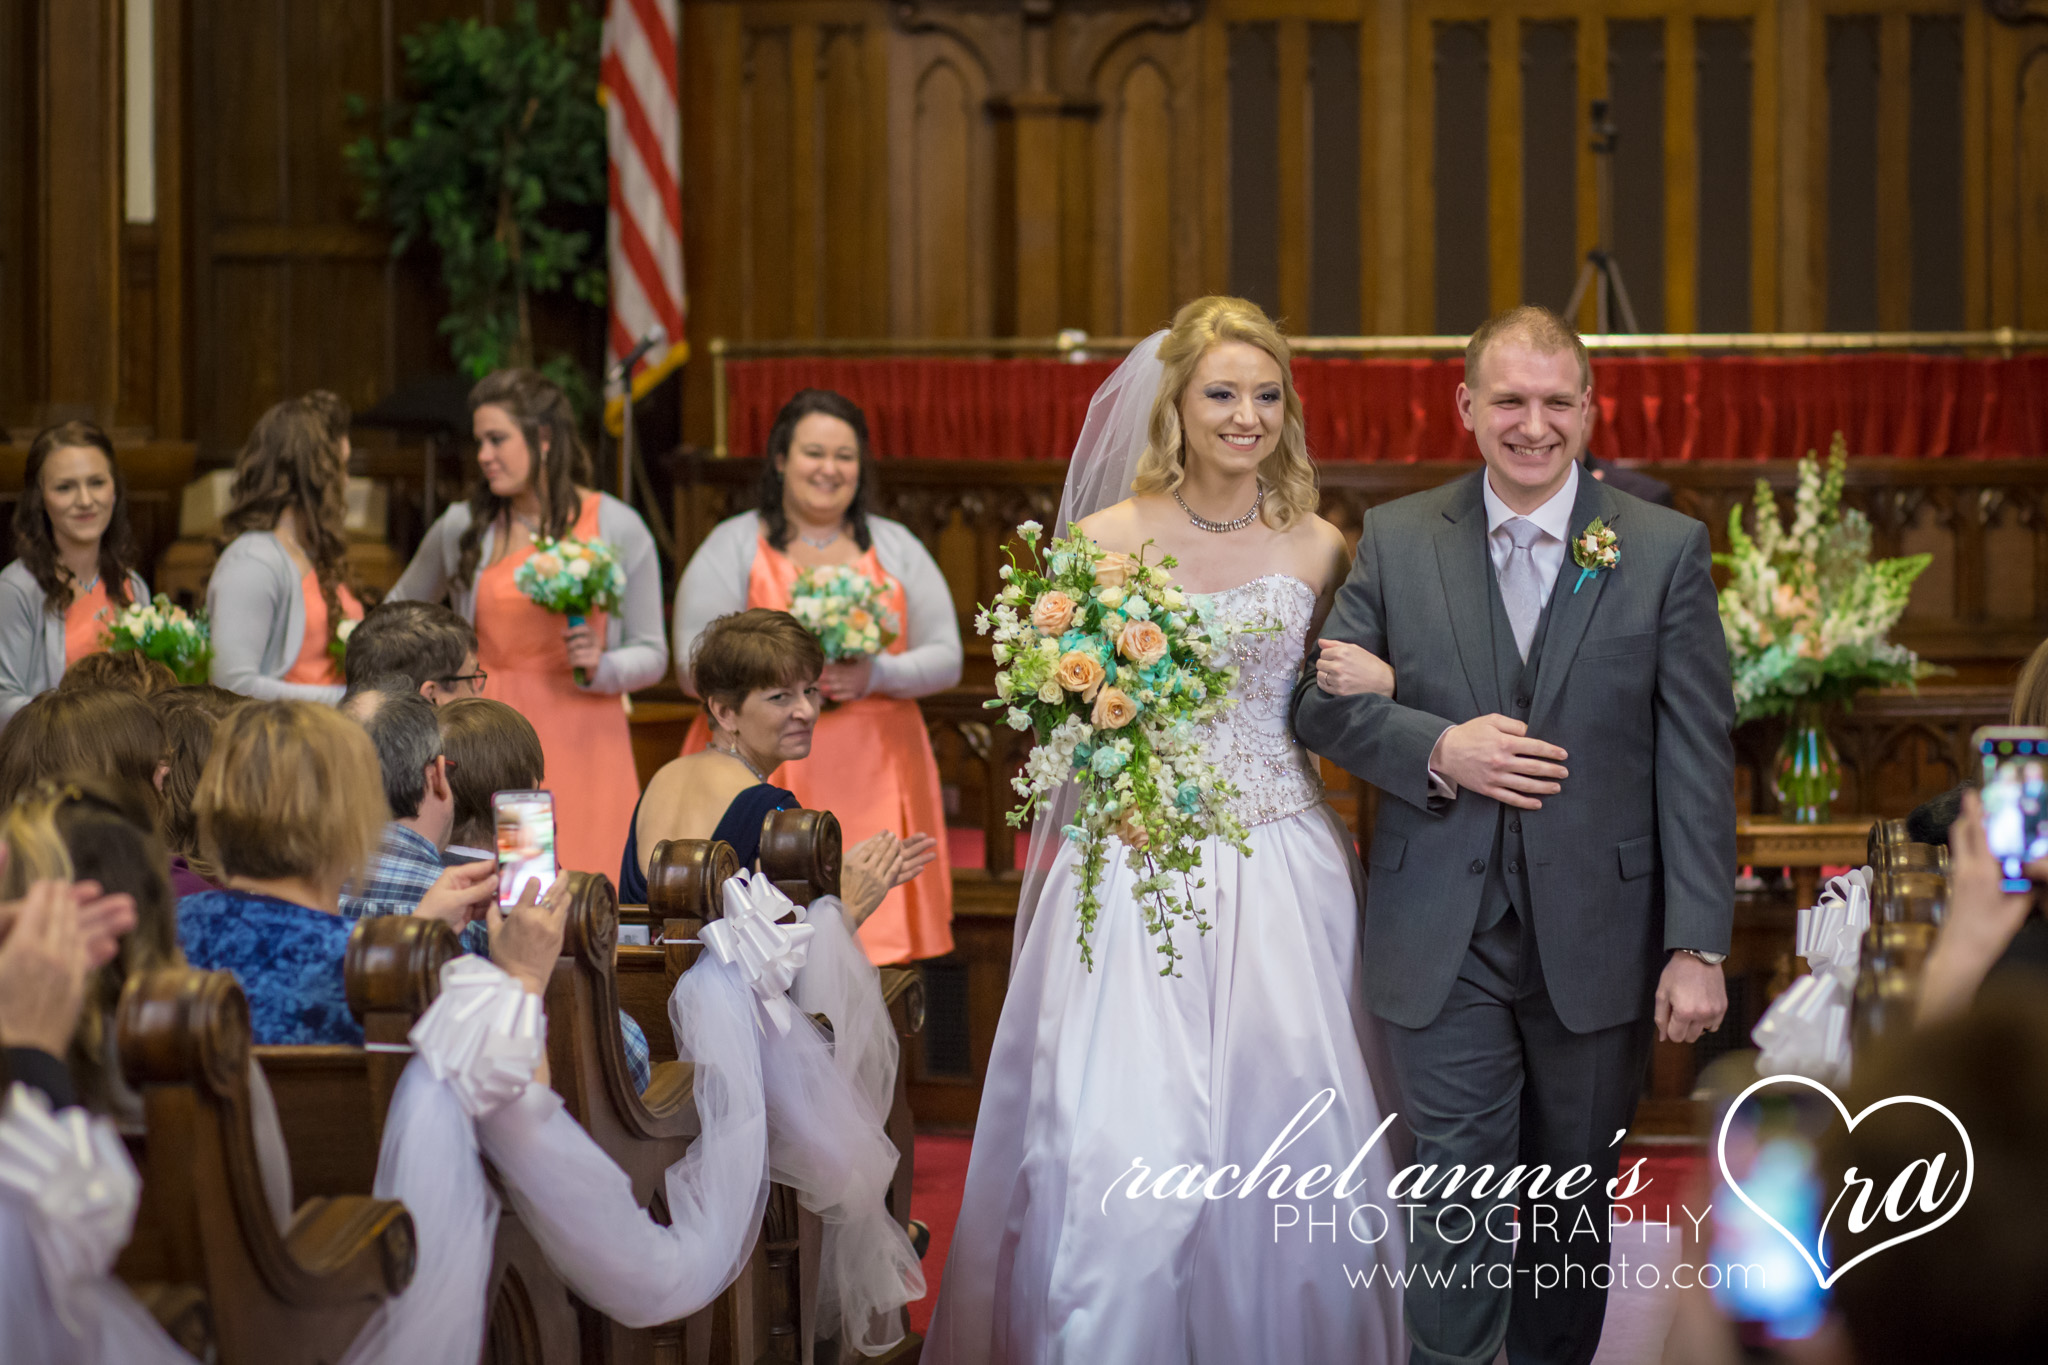 028-JKS-WEDDINGS-THE-FRANKLIN-PA.jpg